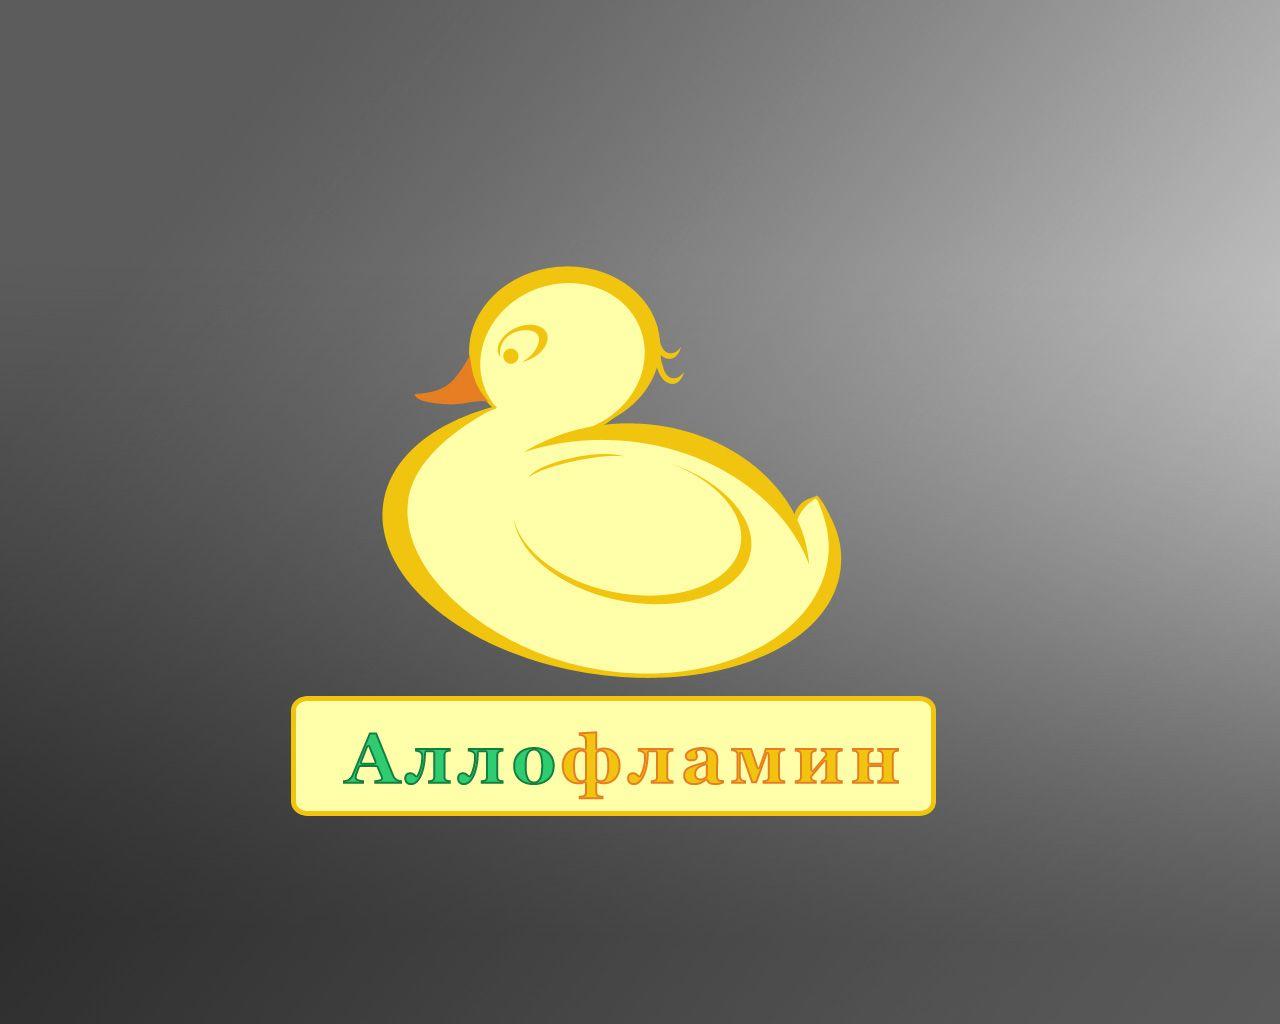 Логотип препарата Аллофламин - дизайнер Anatol_Dubinin